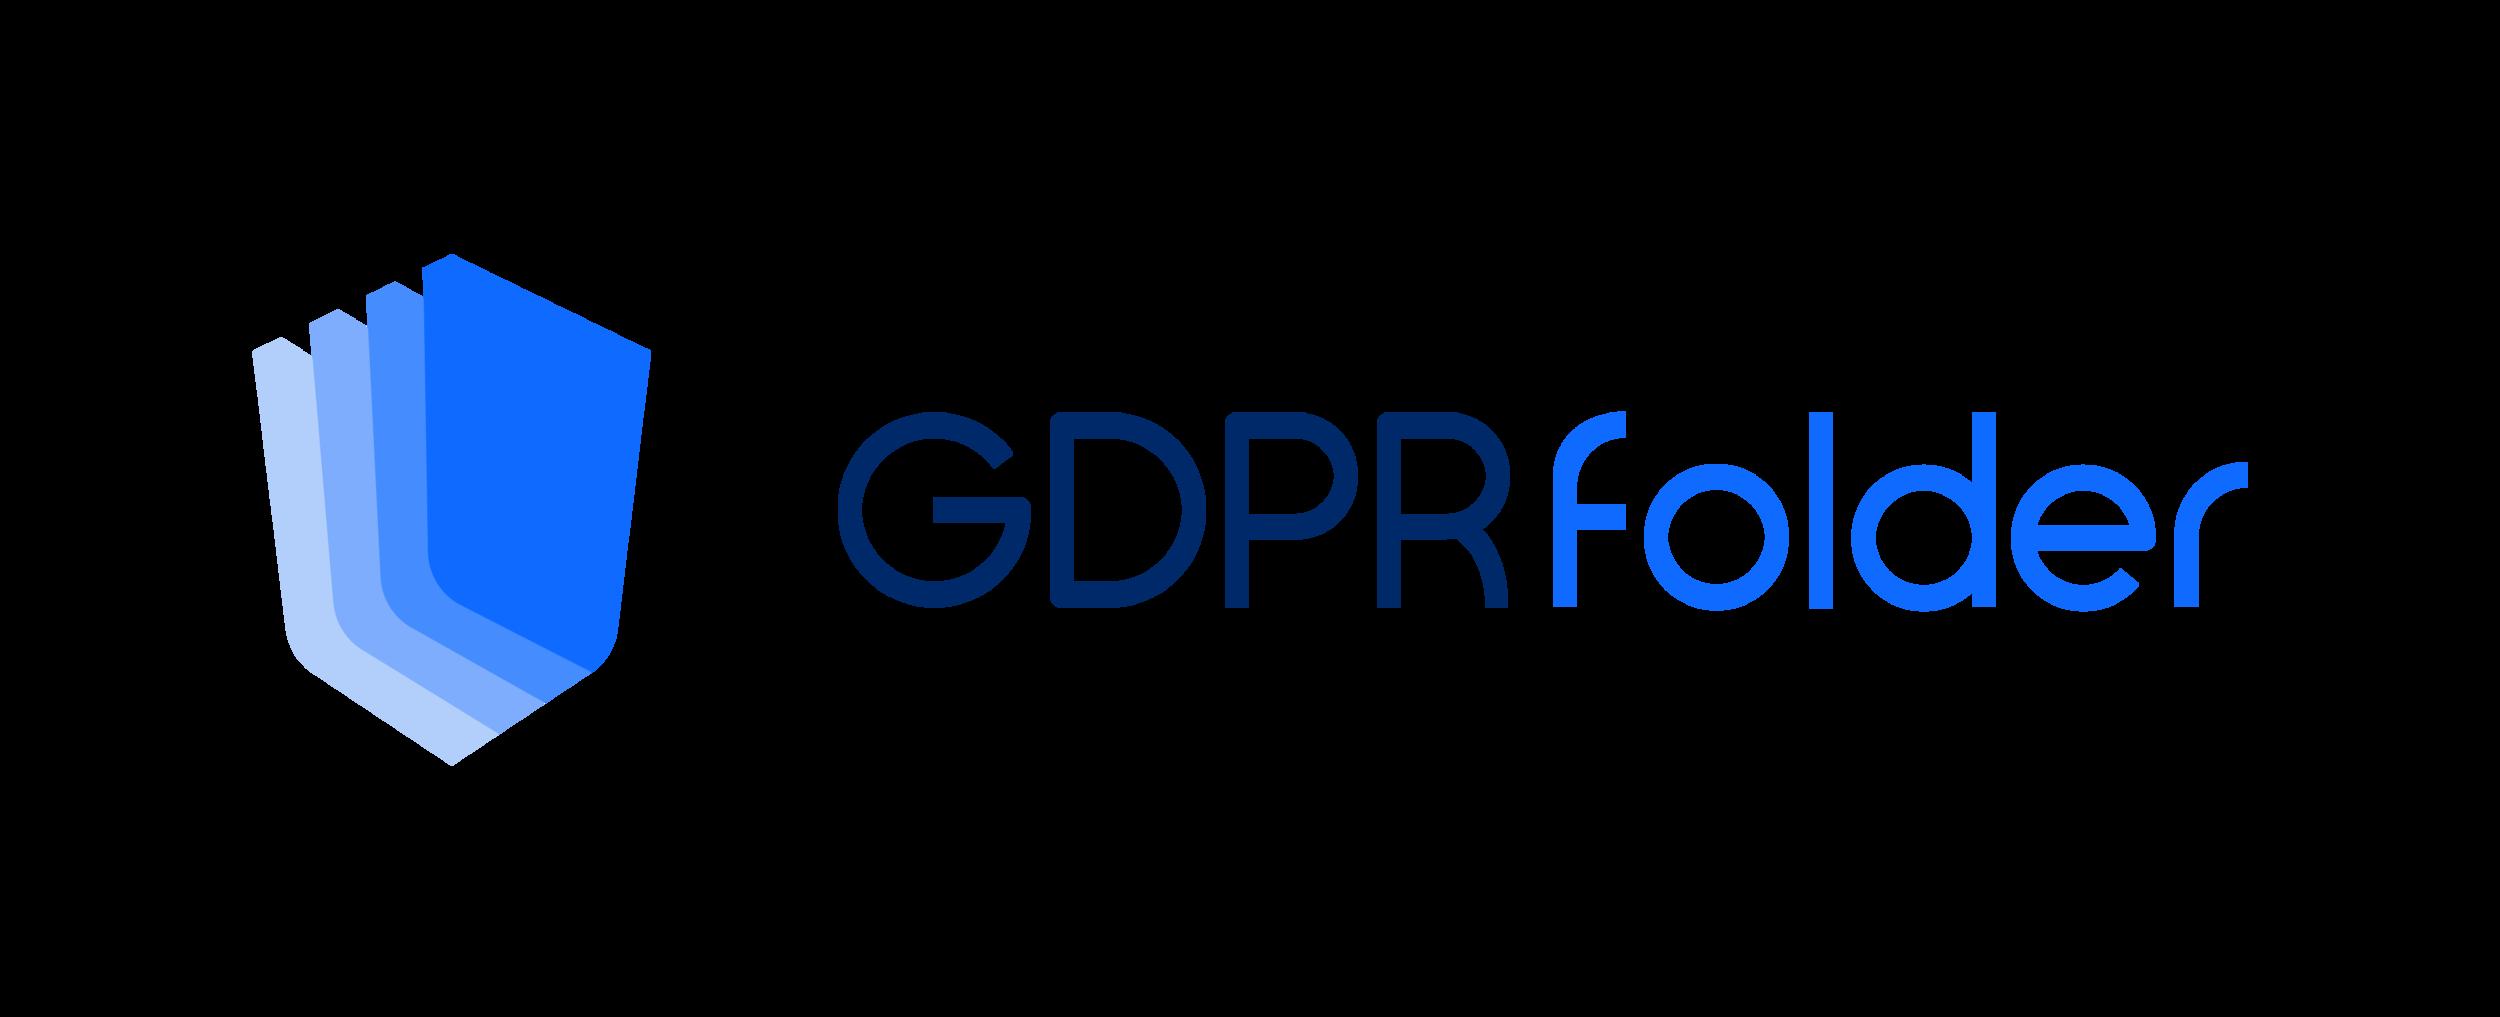 GDPRfolder_export_logo_logo_couleur.png